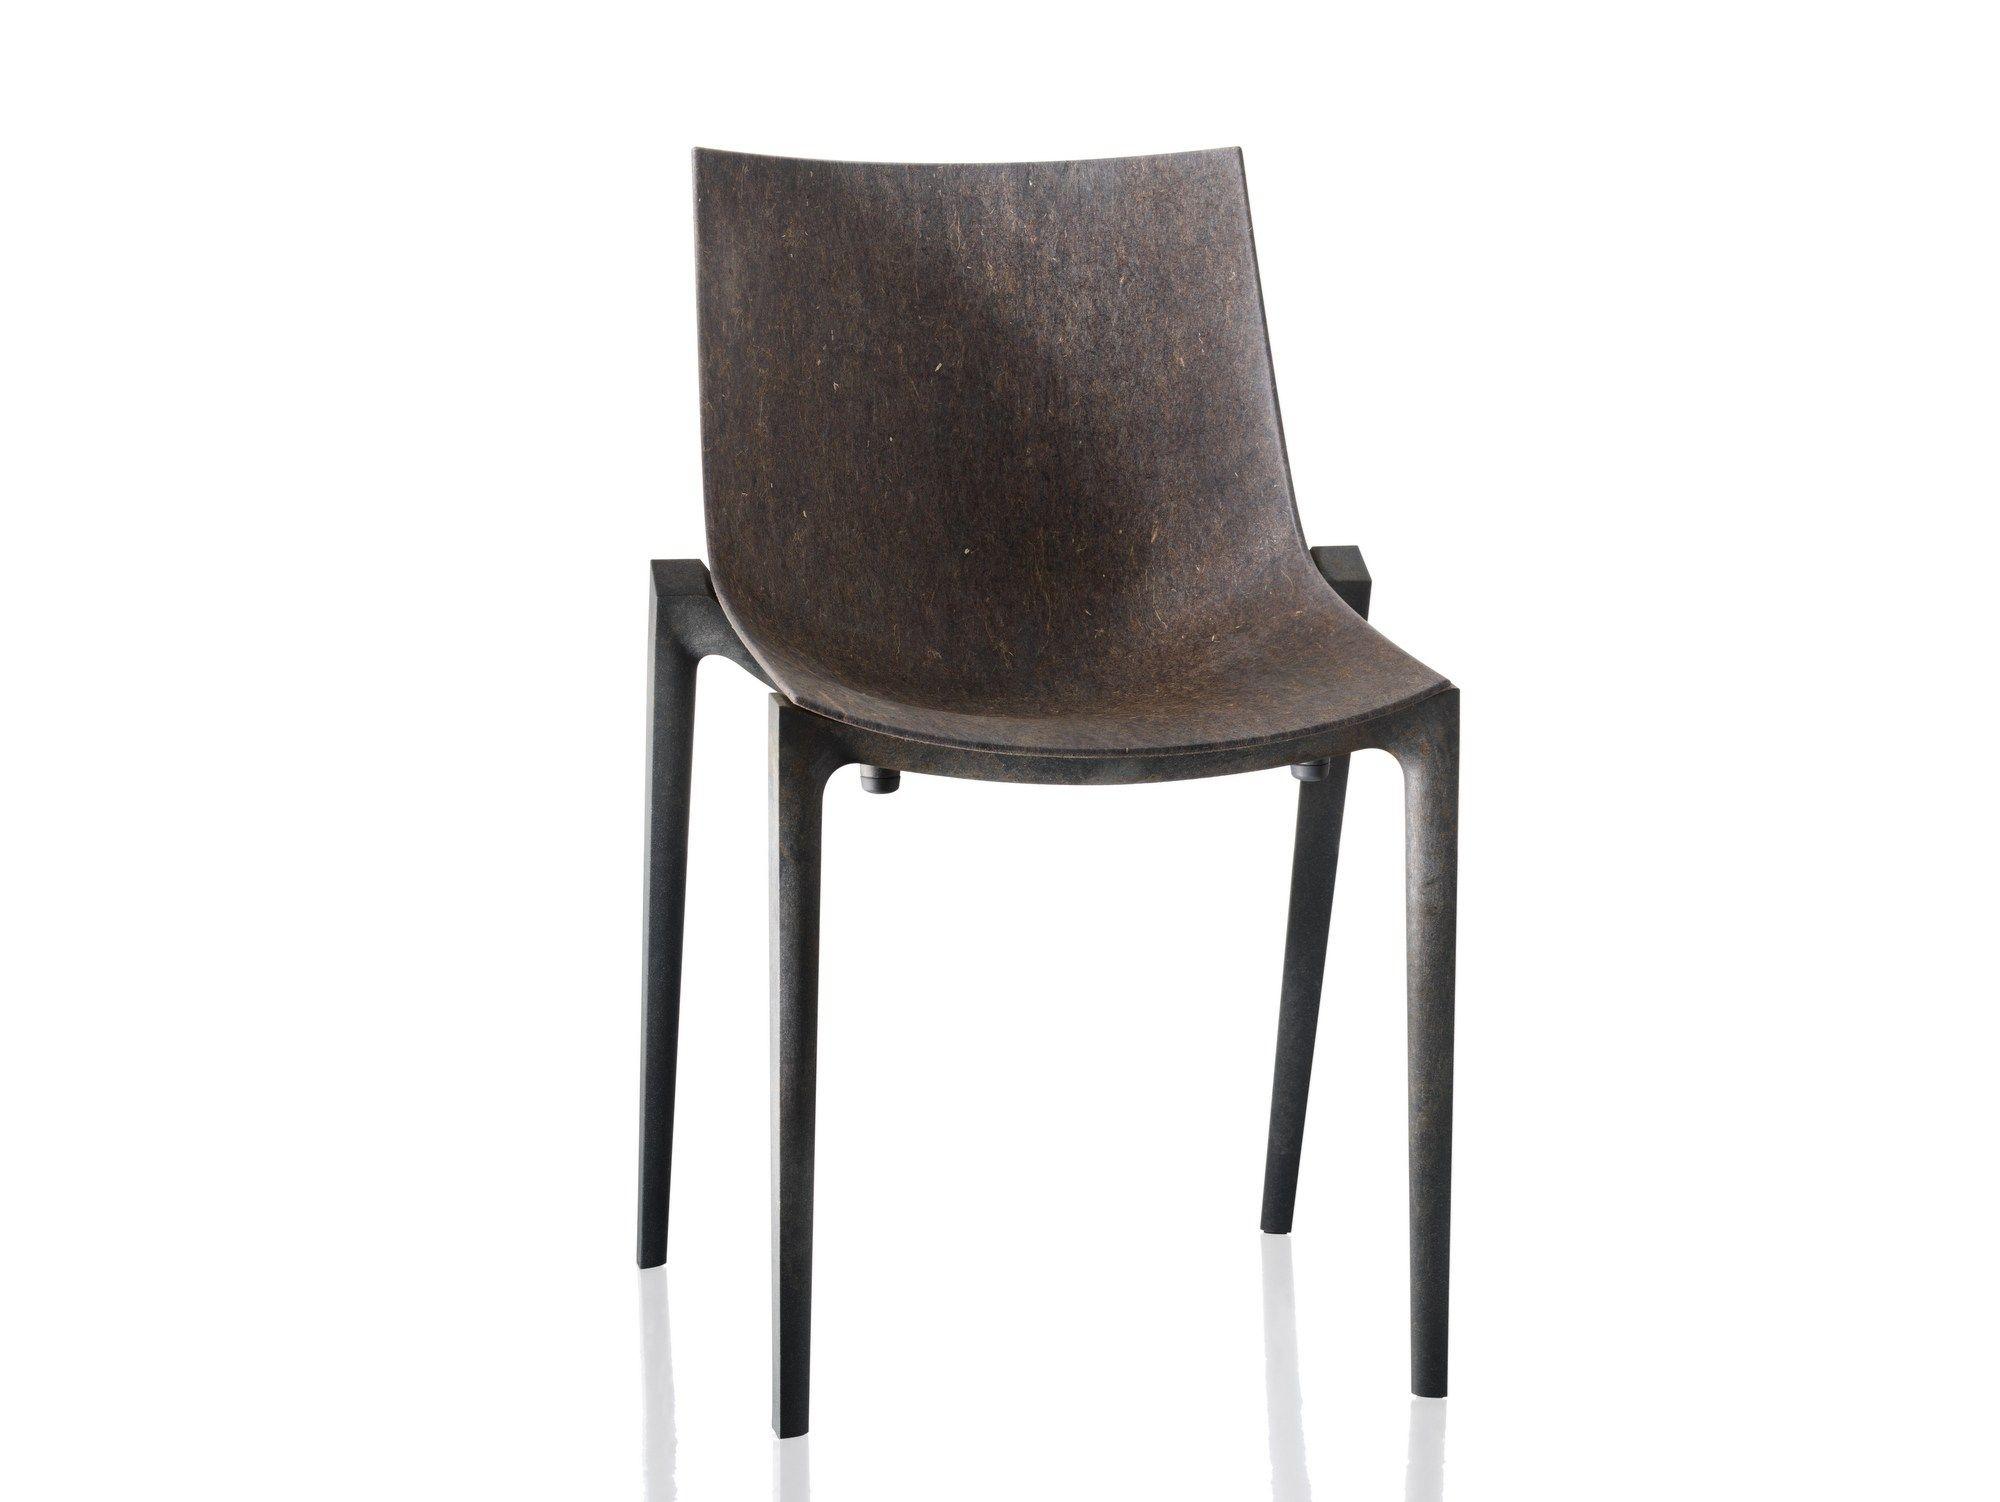 Polypropylene chair ZARTAN ECO By Magis design Philippe Starck